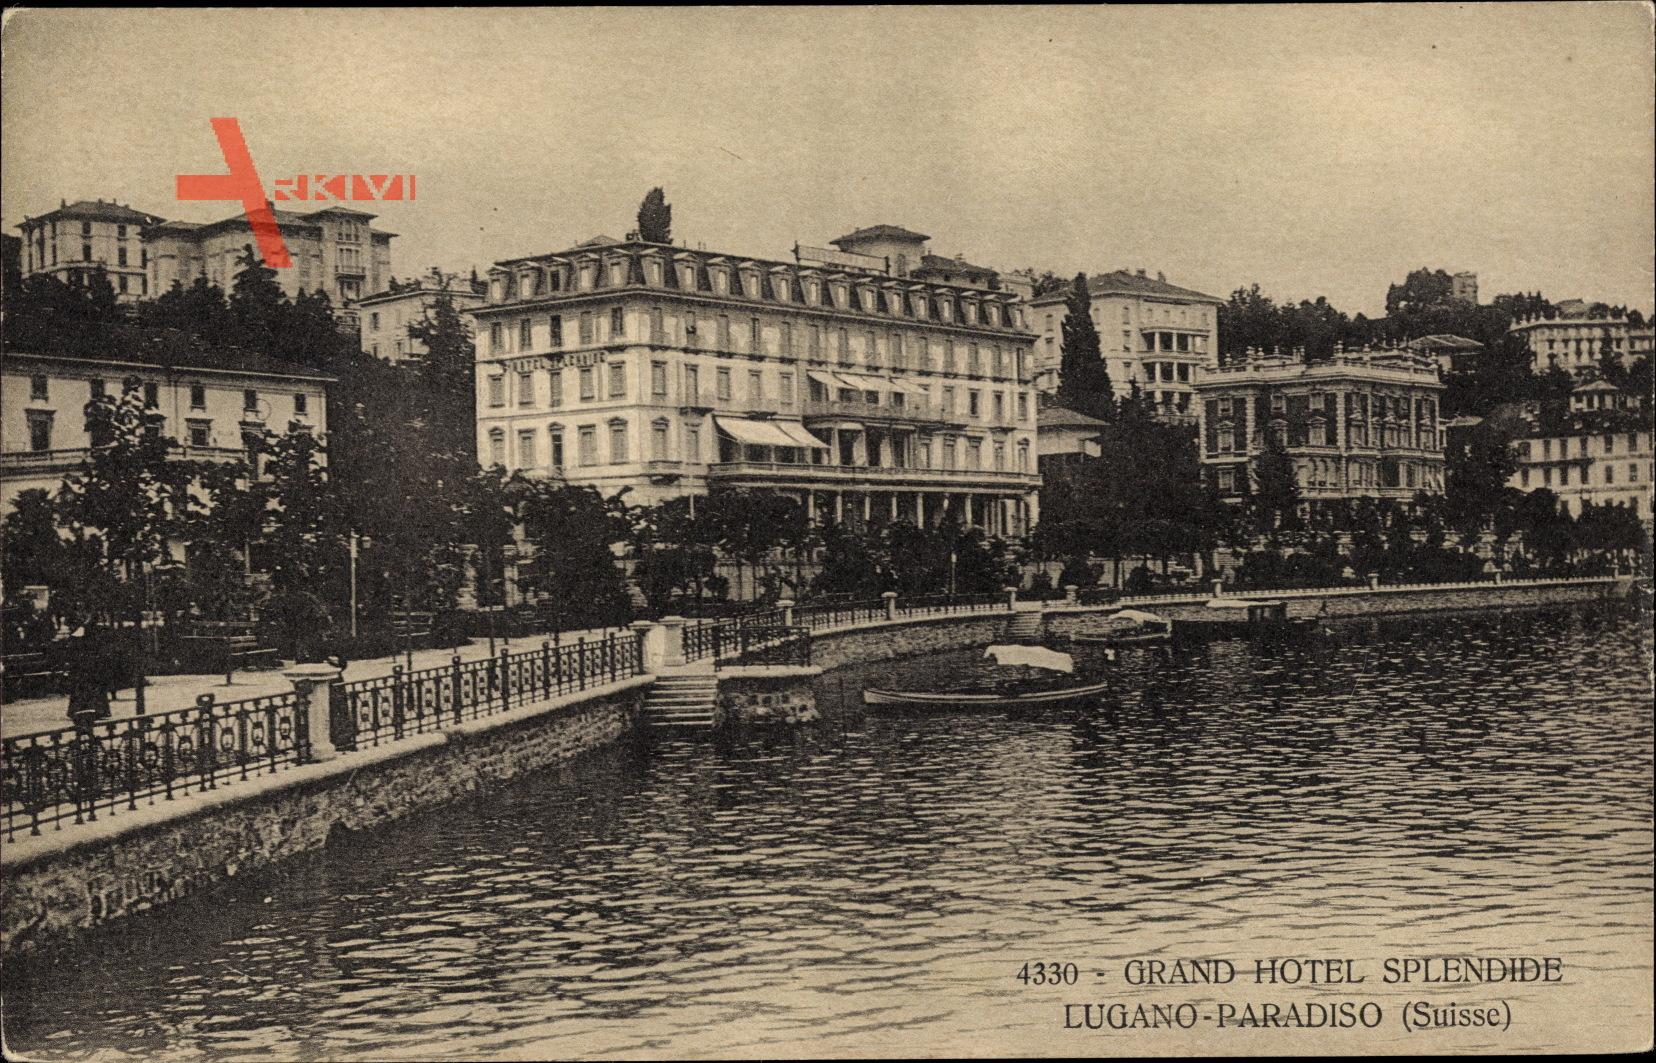 Lugano Paradiso Kt. Tessin Schweiz, Grand Hotel Splendide, Uferpartie